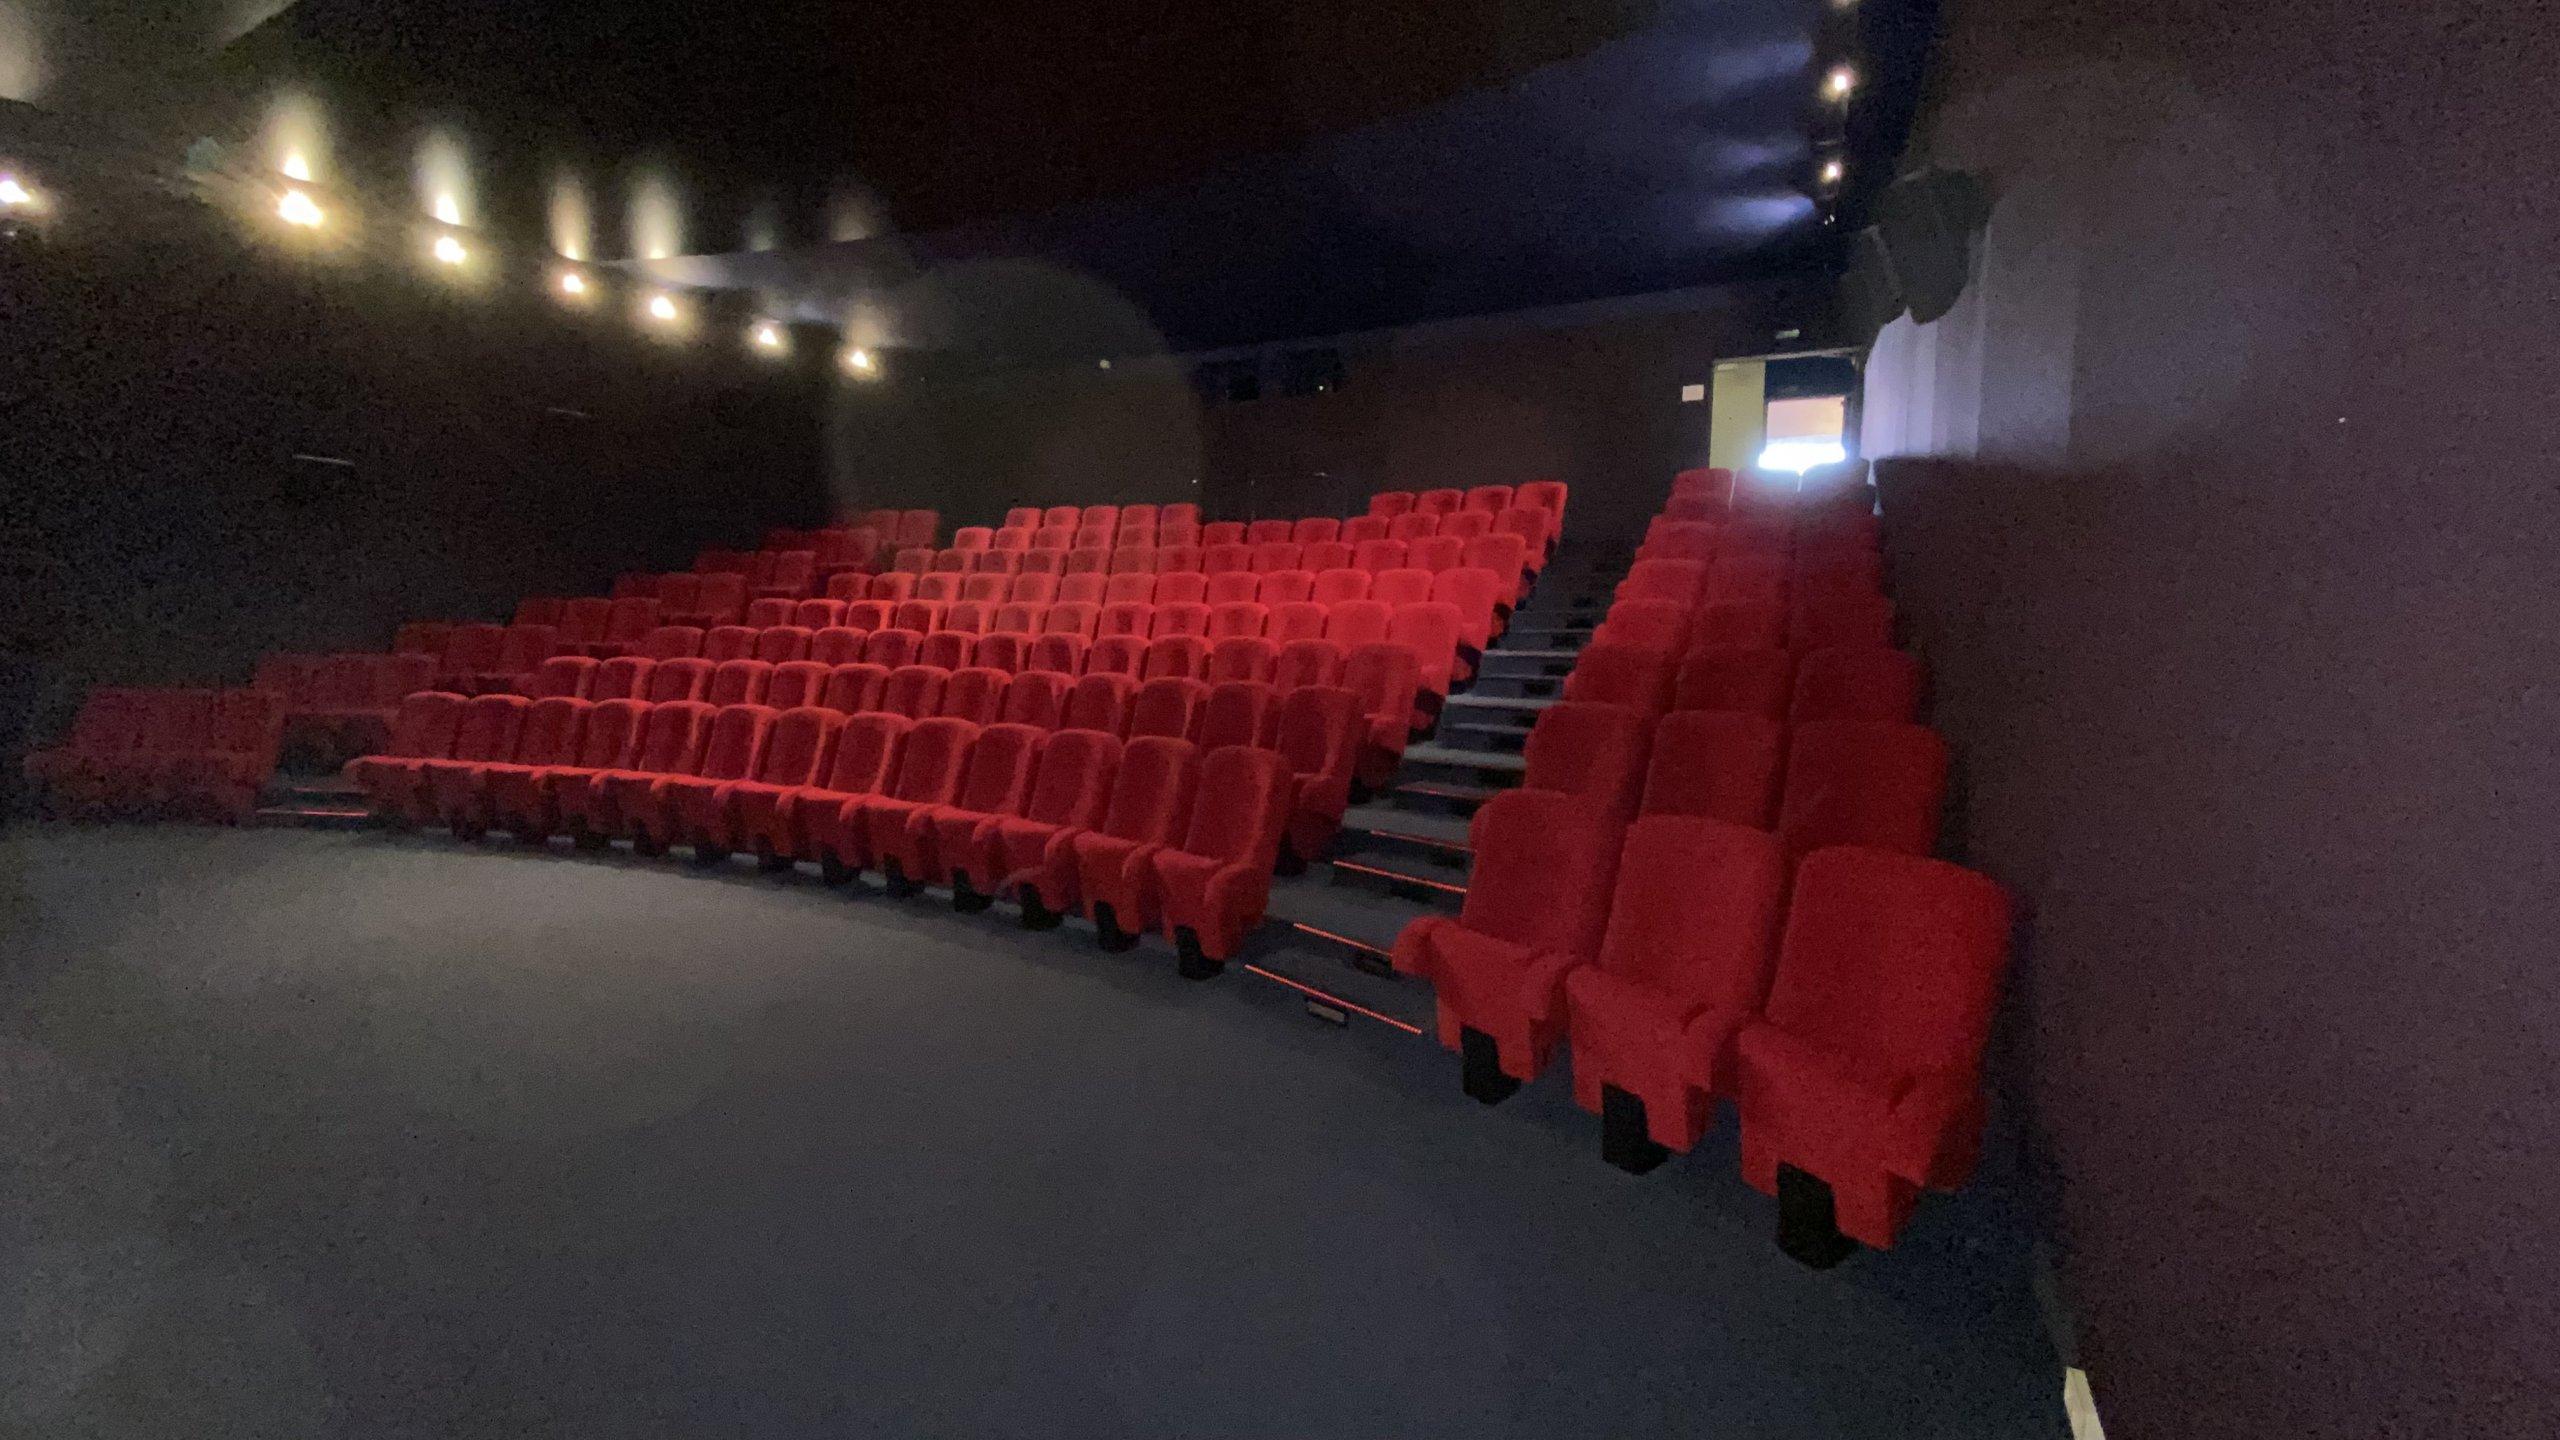 Kleslo - Puto- Leader de fabrication de fauteuils cinéma, théâtre ... cinema admosphere oyonnax v4